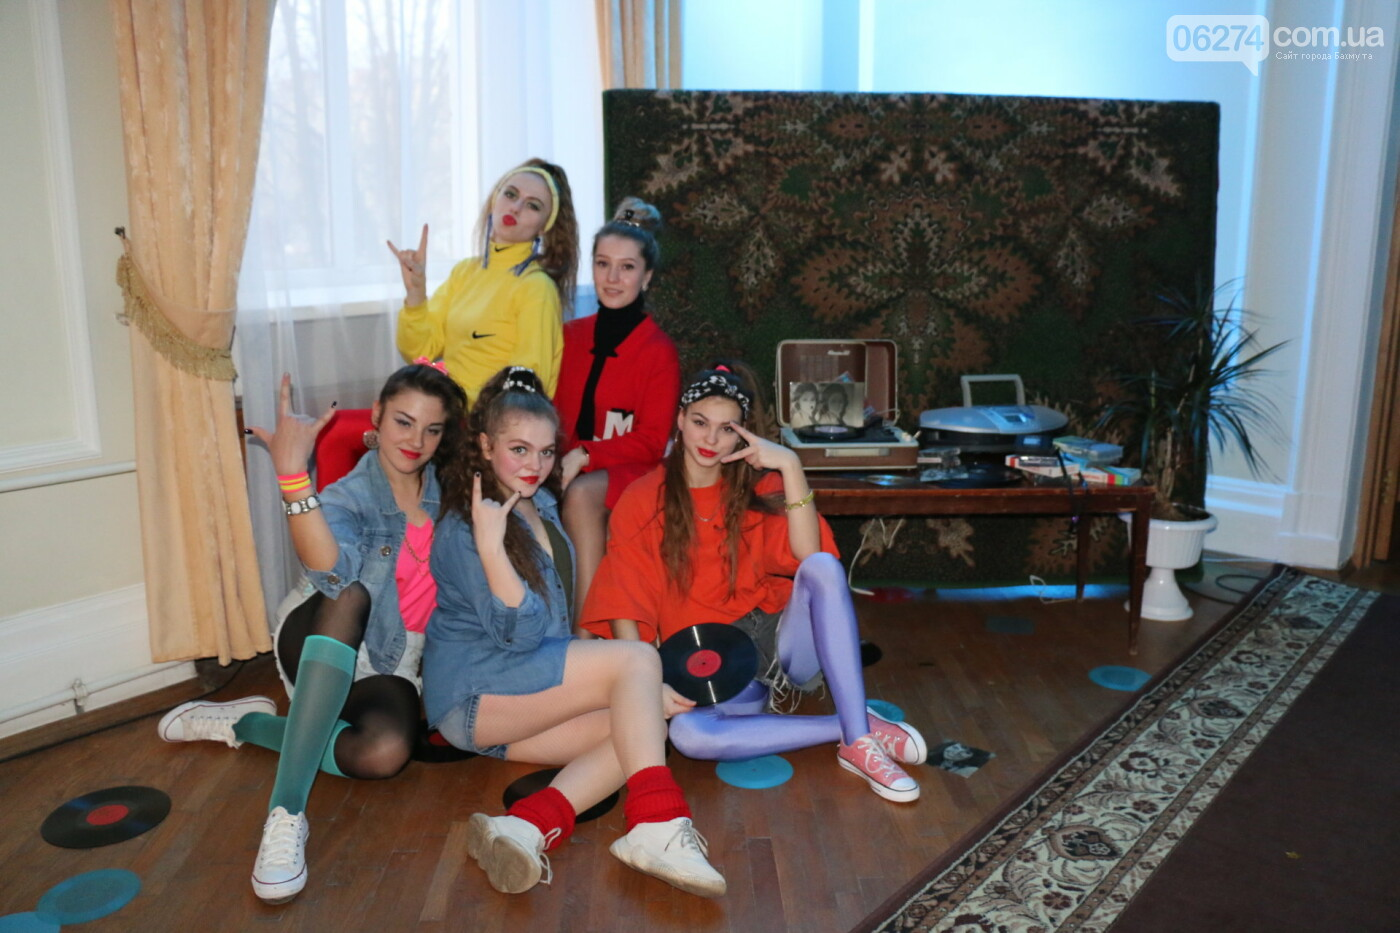 В Бахмуте провели Disco House Party (ФОТООТЧЕТ), фото-36